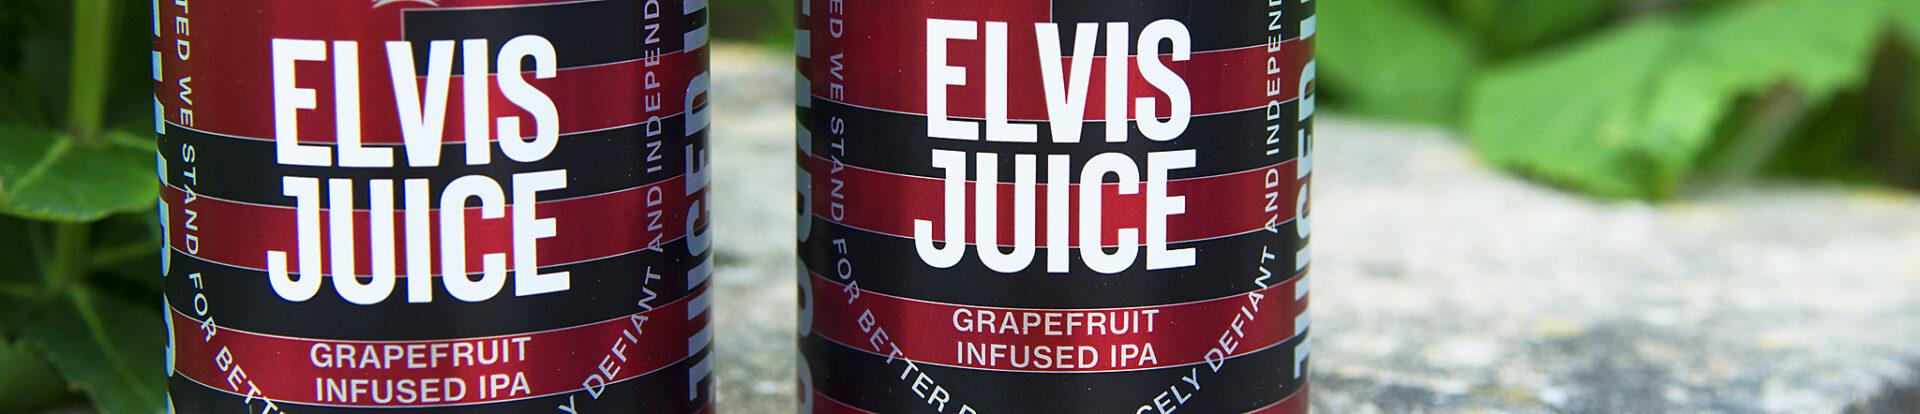 Elvice Juice, Grapefruit Infused IPA - Brewdog